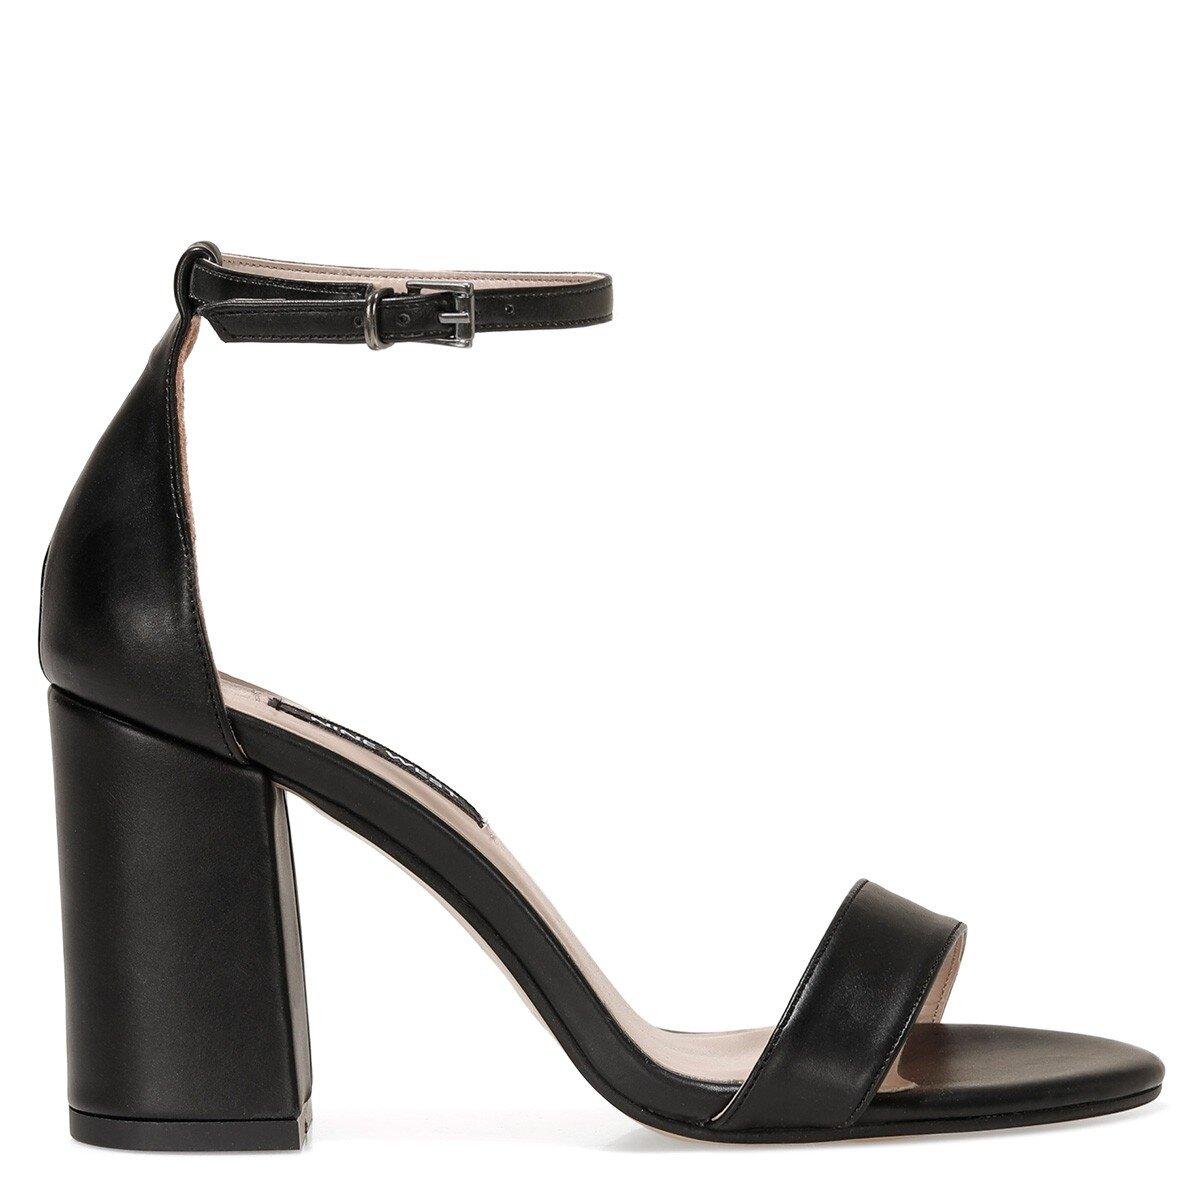 MAYSIE 1FX Siyah Kadın Topuklu Sandalet